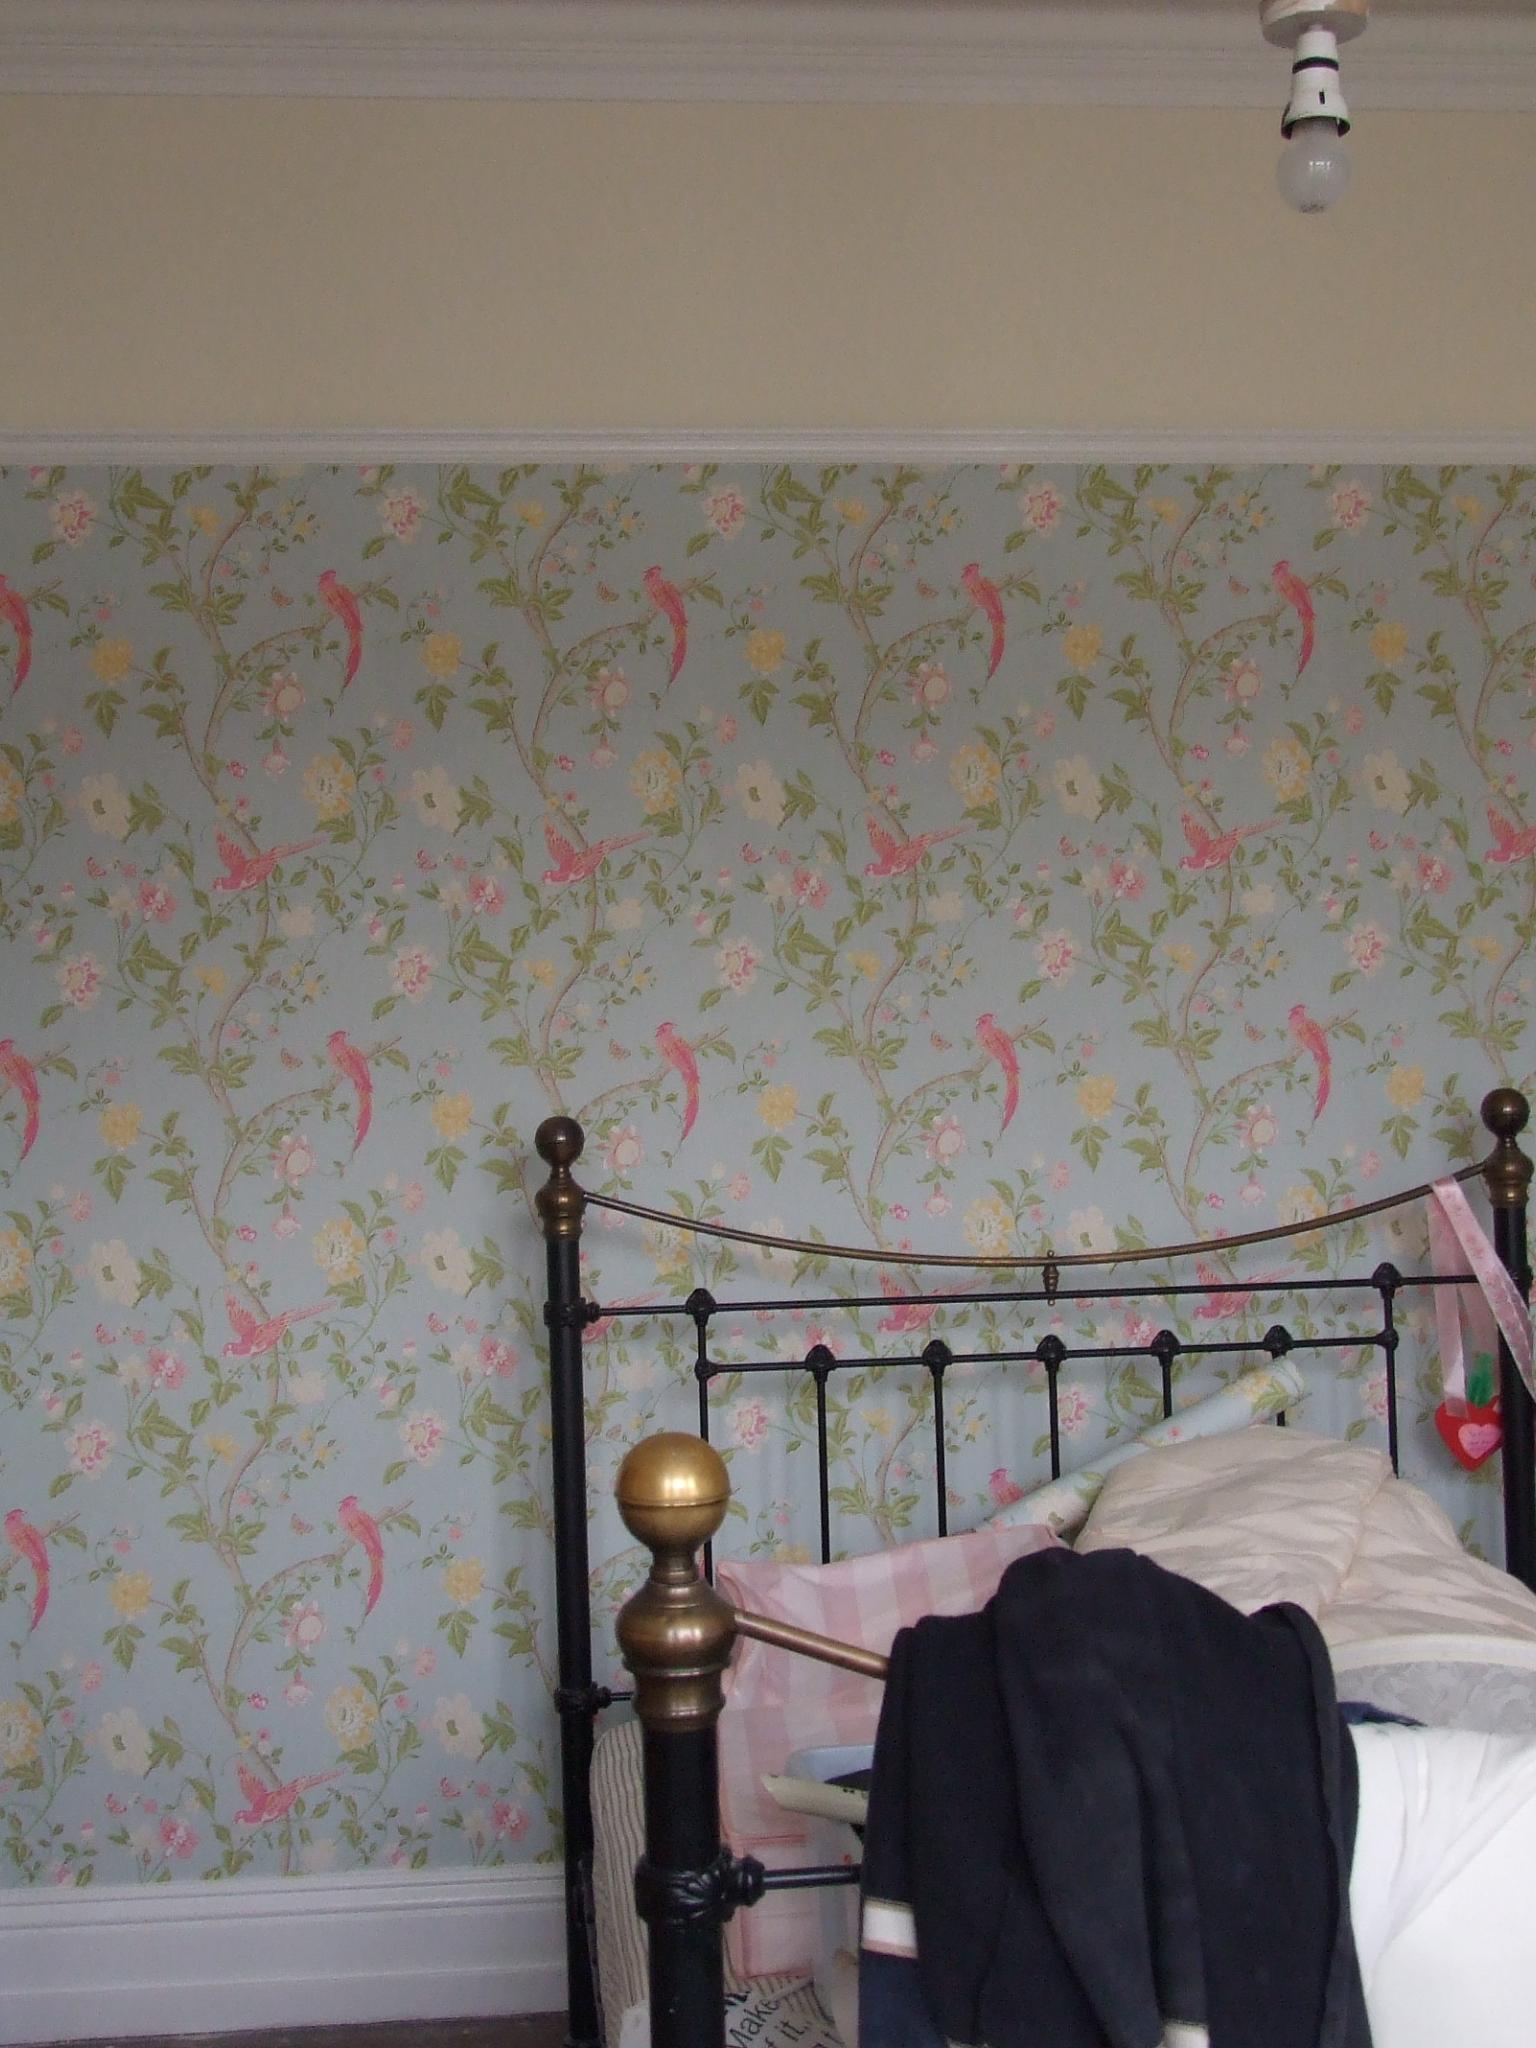 Bedroom Wallpaper Homebase Dscf1098 1536x2048 Download Hd Wallpaper Wallpapertip